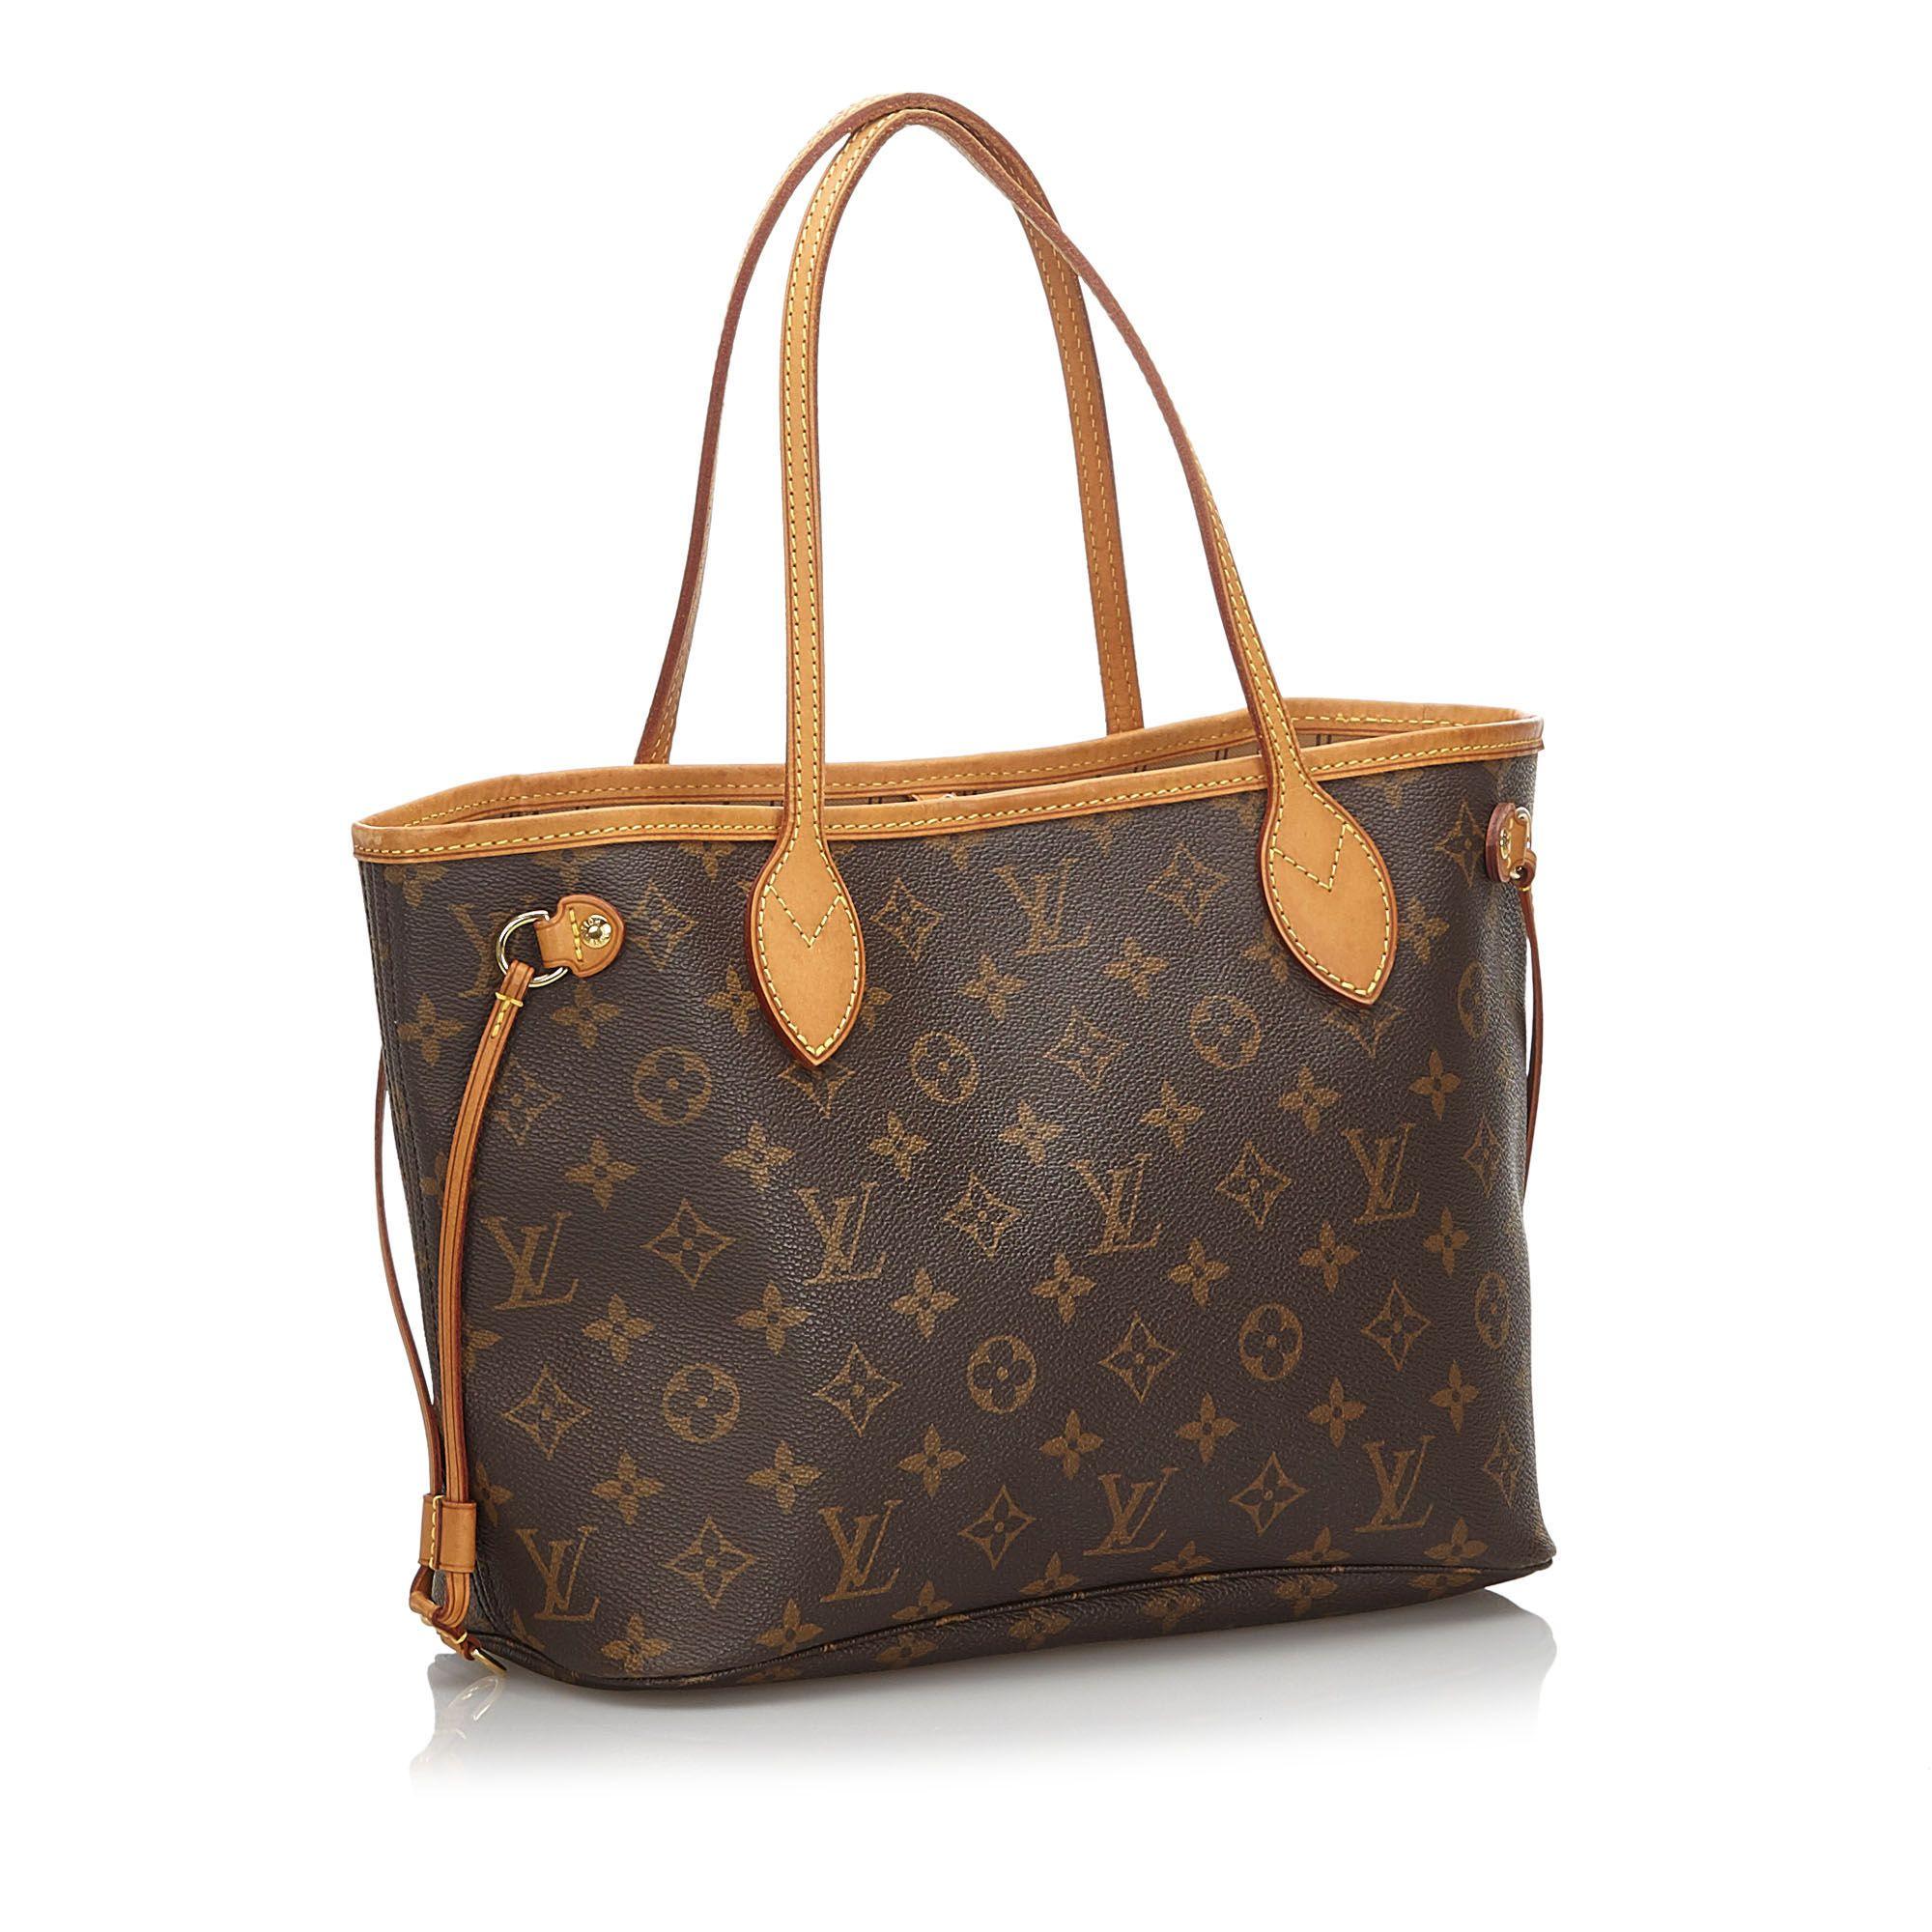 Vintage Louis Vuitton Monogram Neverfull PM Brown